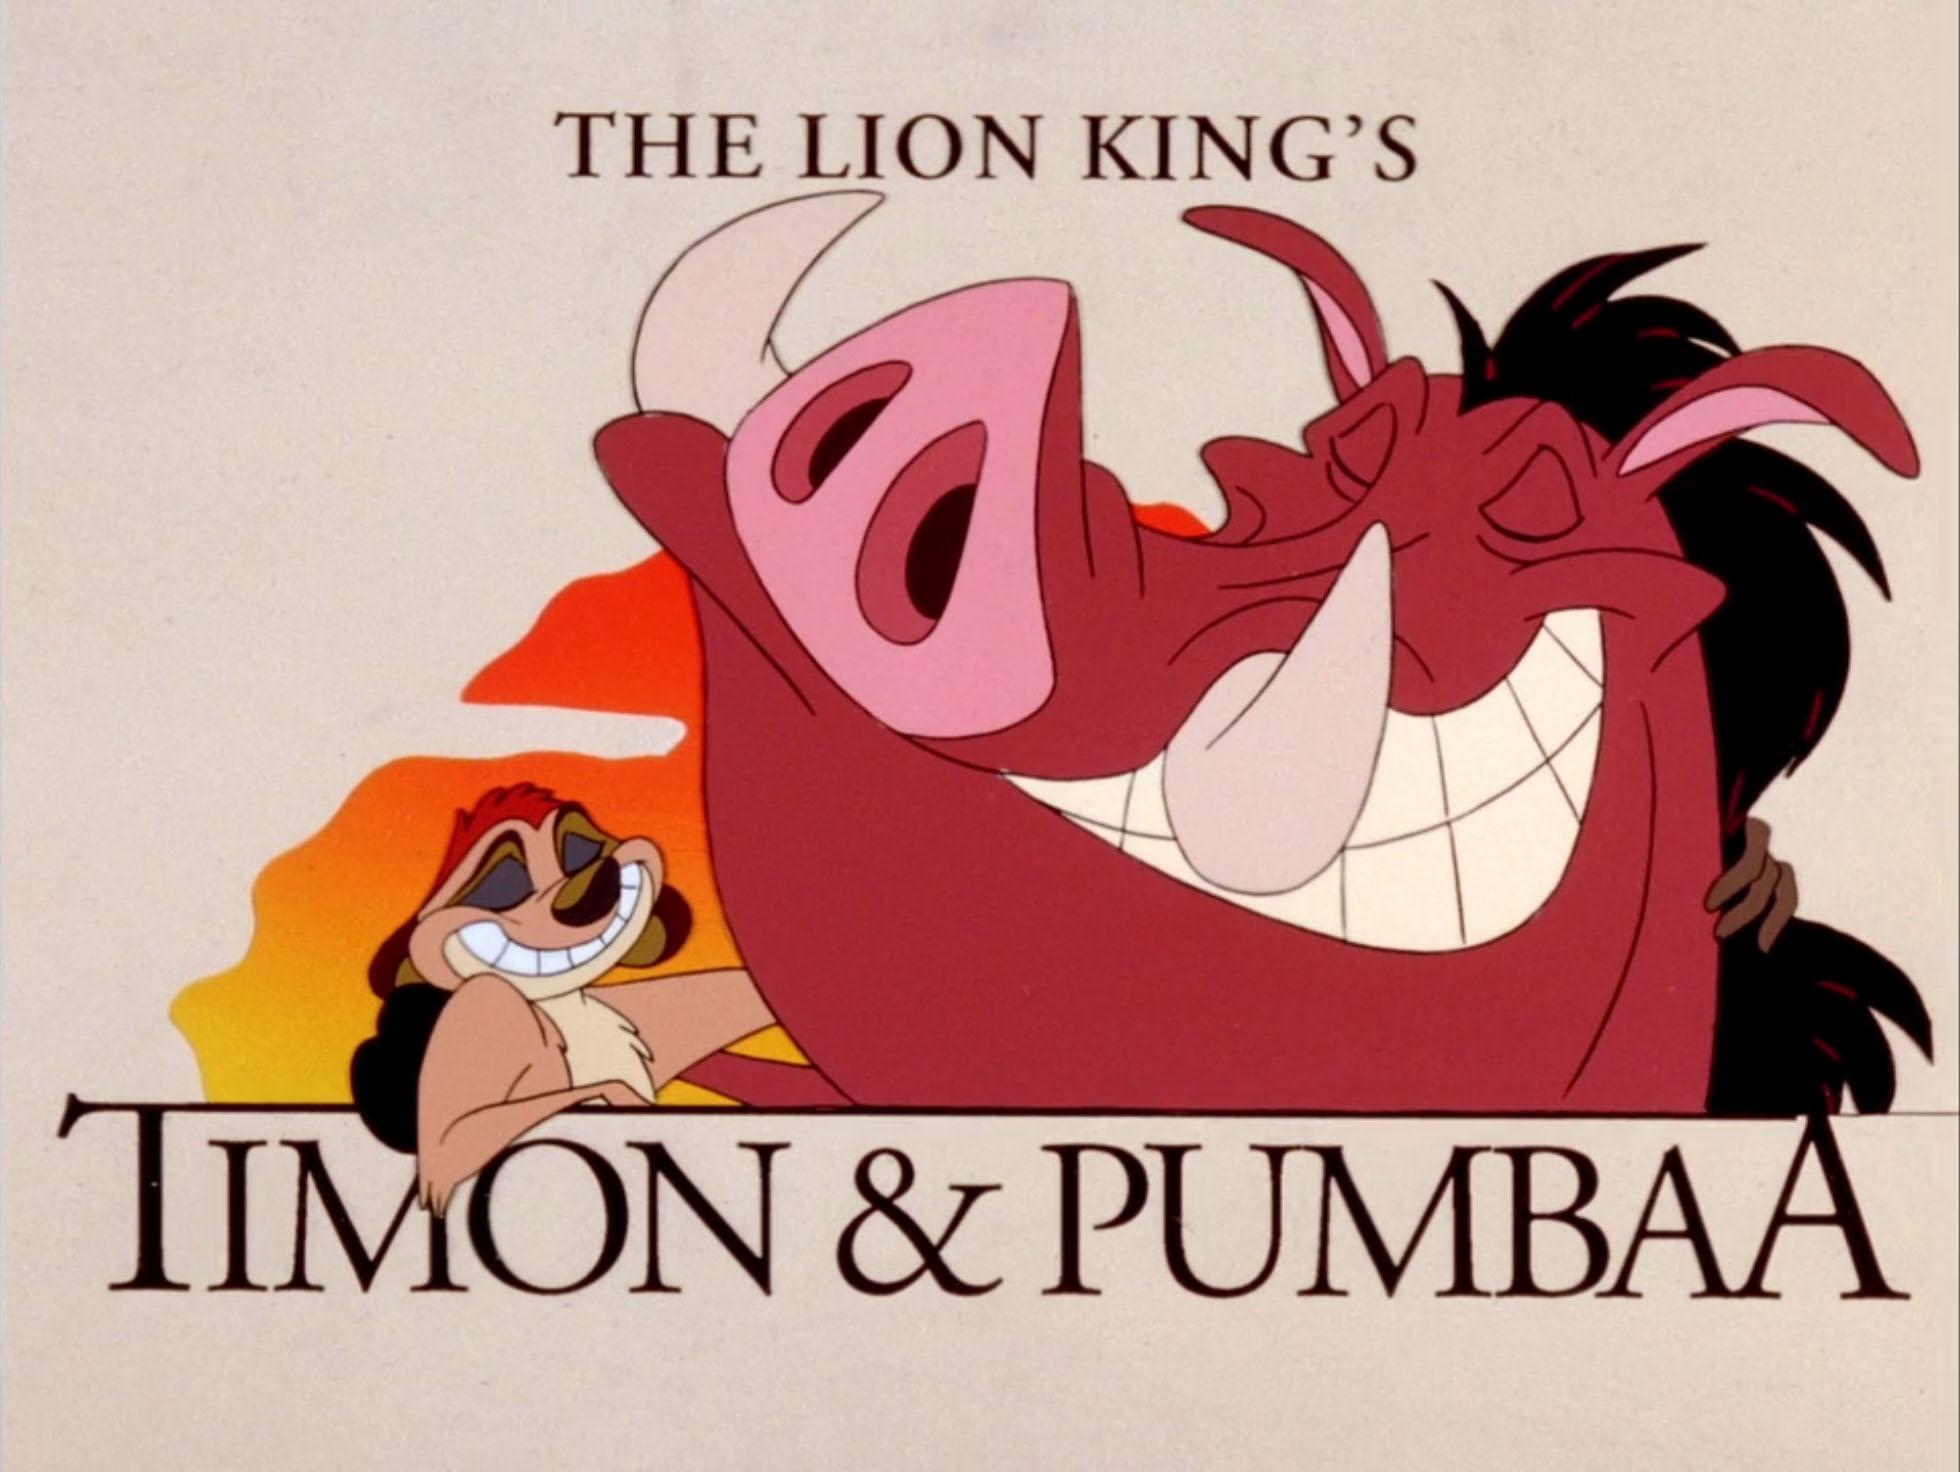 File:Timon and pumbaa-show.jpg